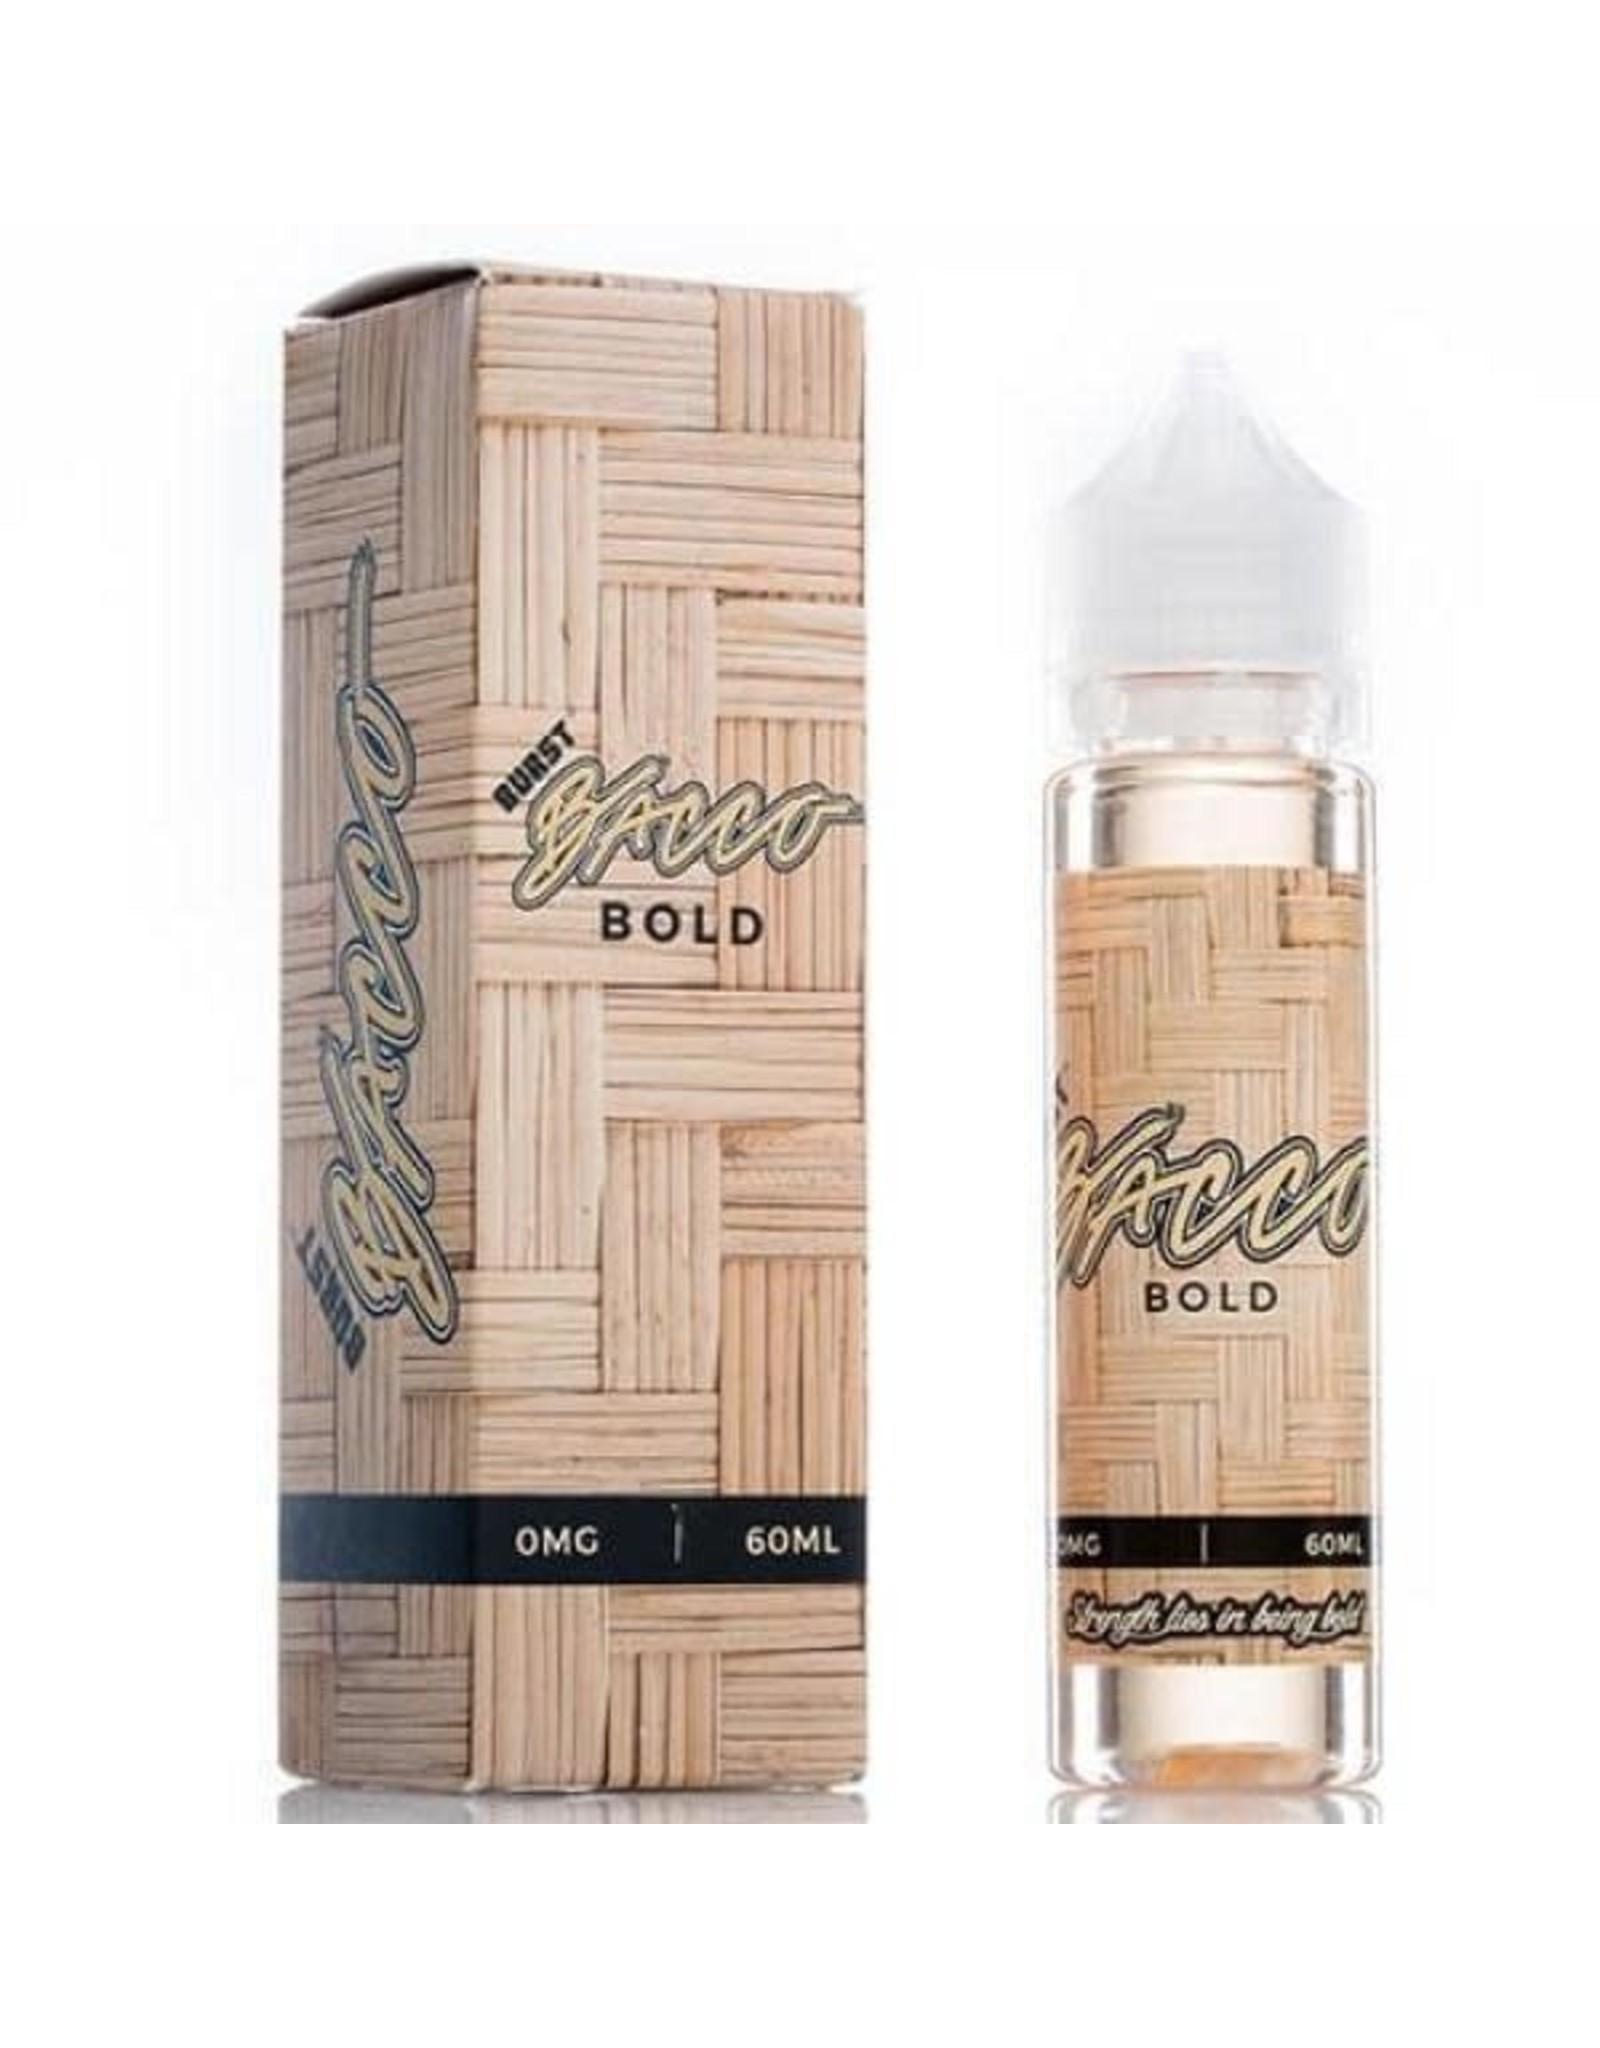 Burst E-liquid Bacco Bold 60 ML 0 MG